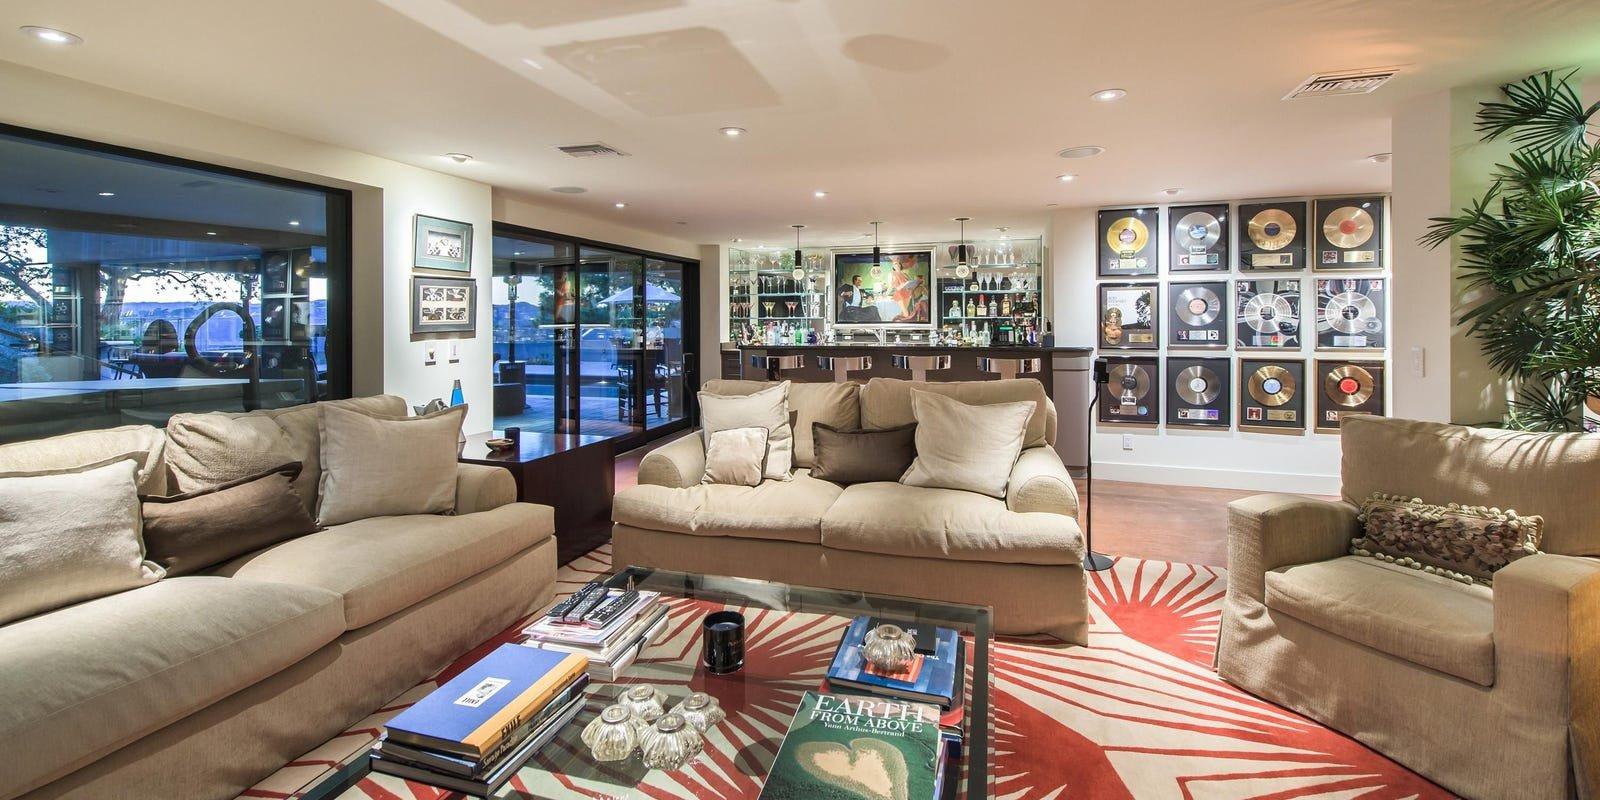 Finding Dory Bedroom Decor Unique Jane Fonda & Richard Perry List Eco Home at $12 999m